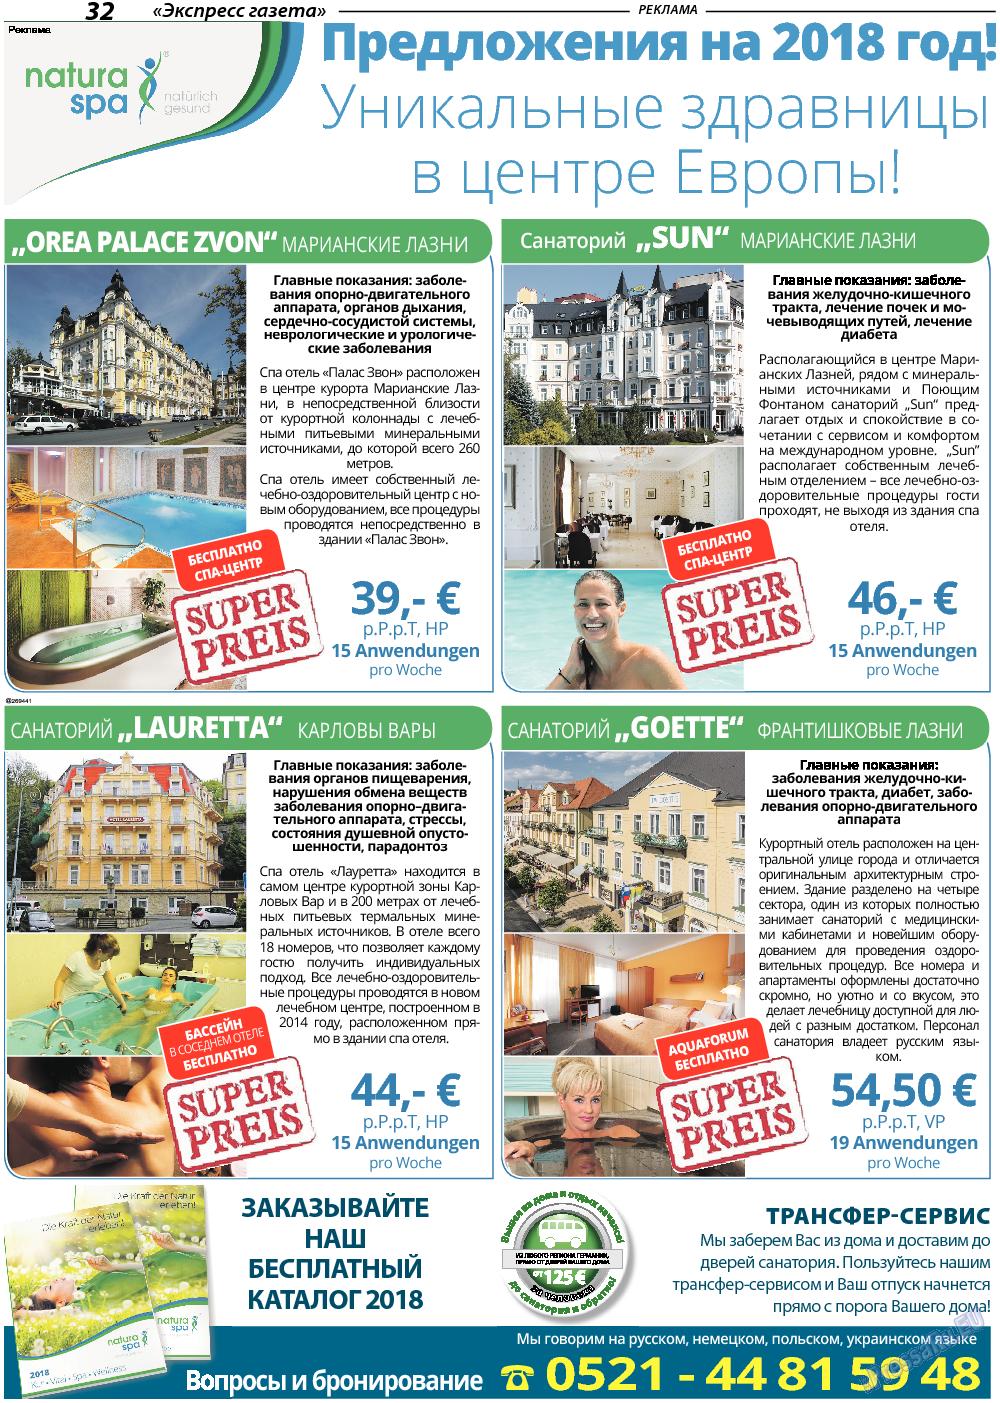 Экспресс газета (газета). 2018 год, номер 2, стр. 32